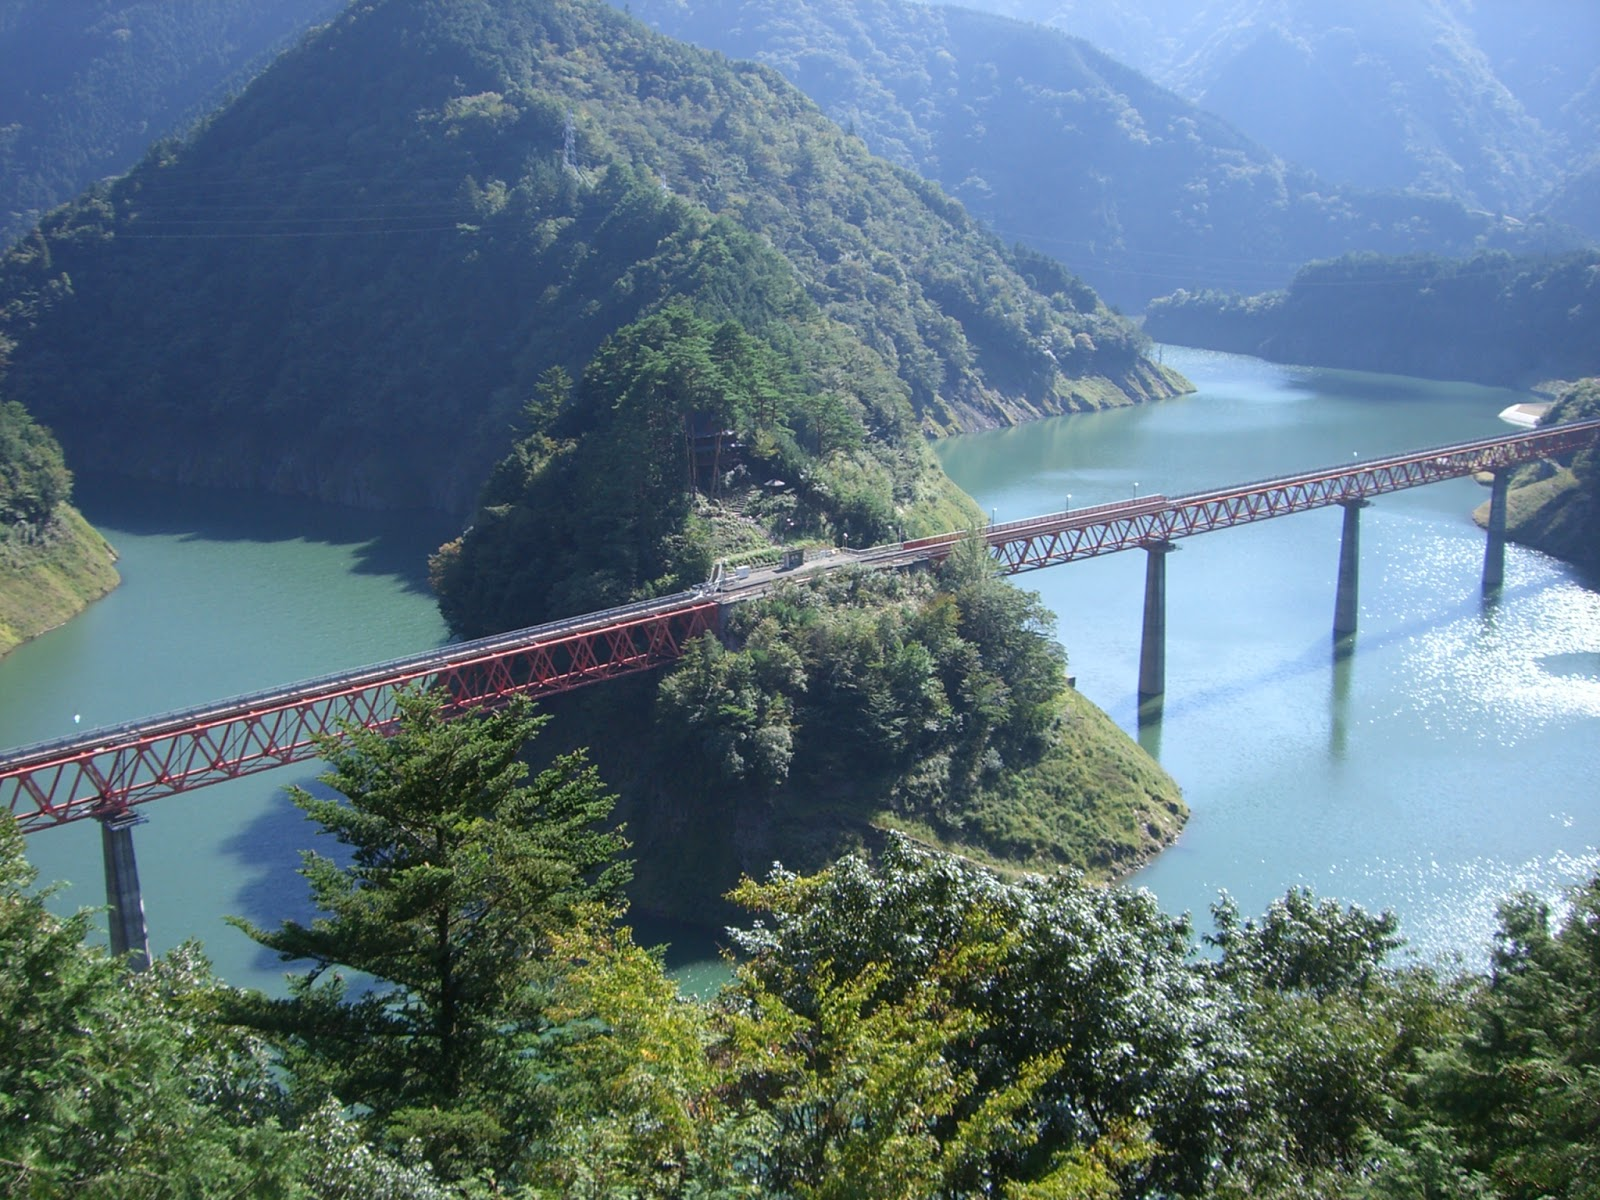 https://3.bp.blogspot.com/-HrLlI1oUghE/WZtfBGy3bcI/AAAAAAAJz2Y/BmmqJ4yjQXsSL2H86wOCVu_xgh8HOsUHQCLcBGAs/s1600/Oku-oi_Rainbow_Bridge_on_Oigawa_railway.jpg